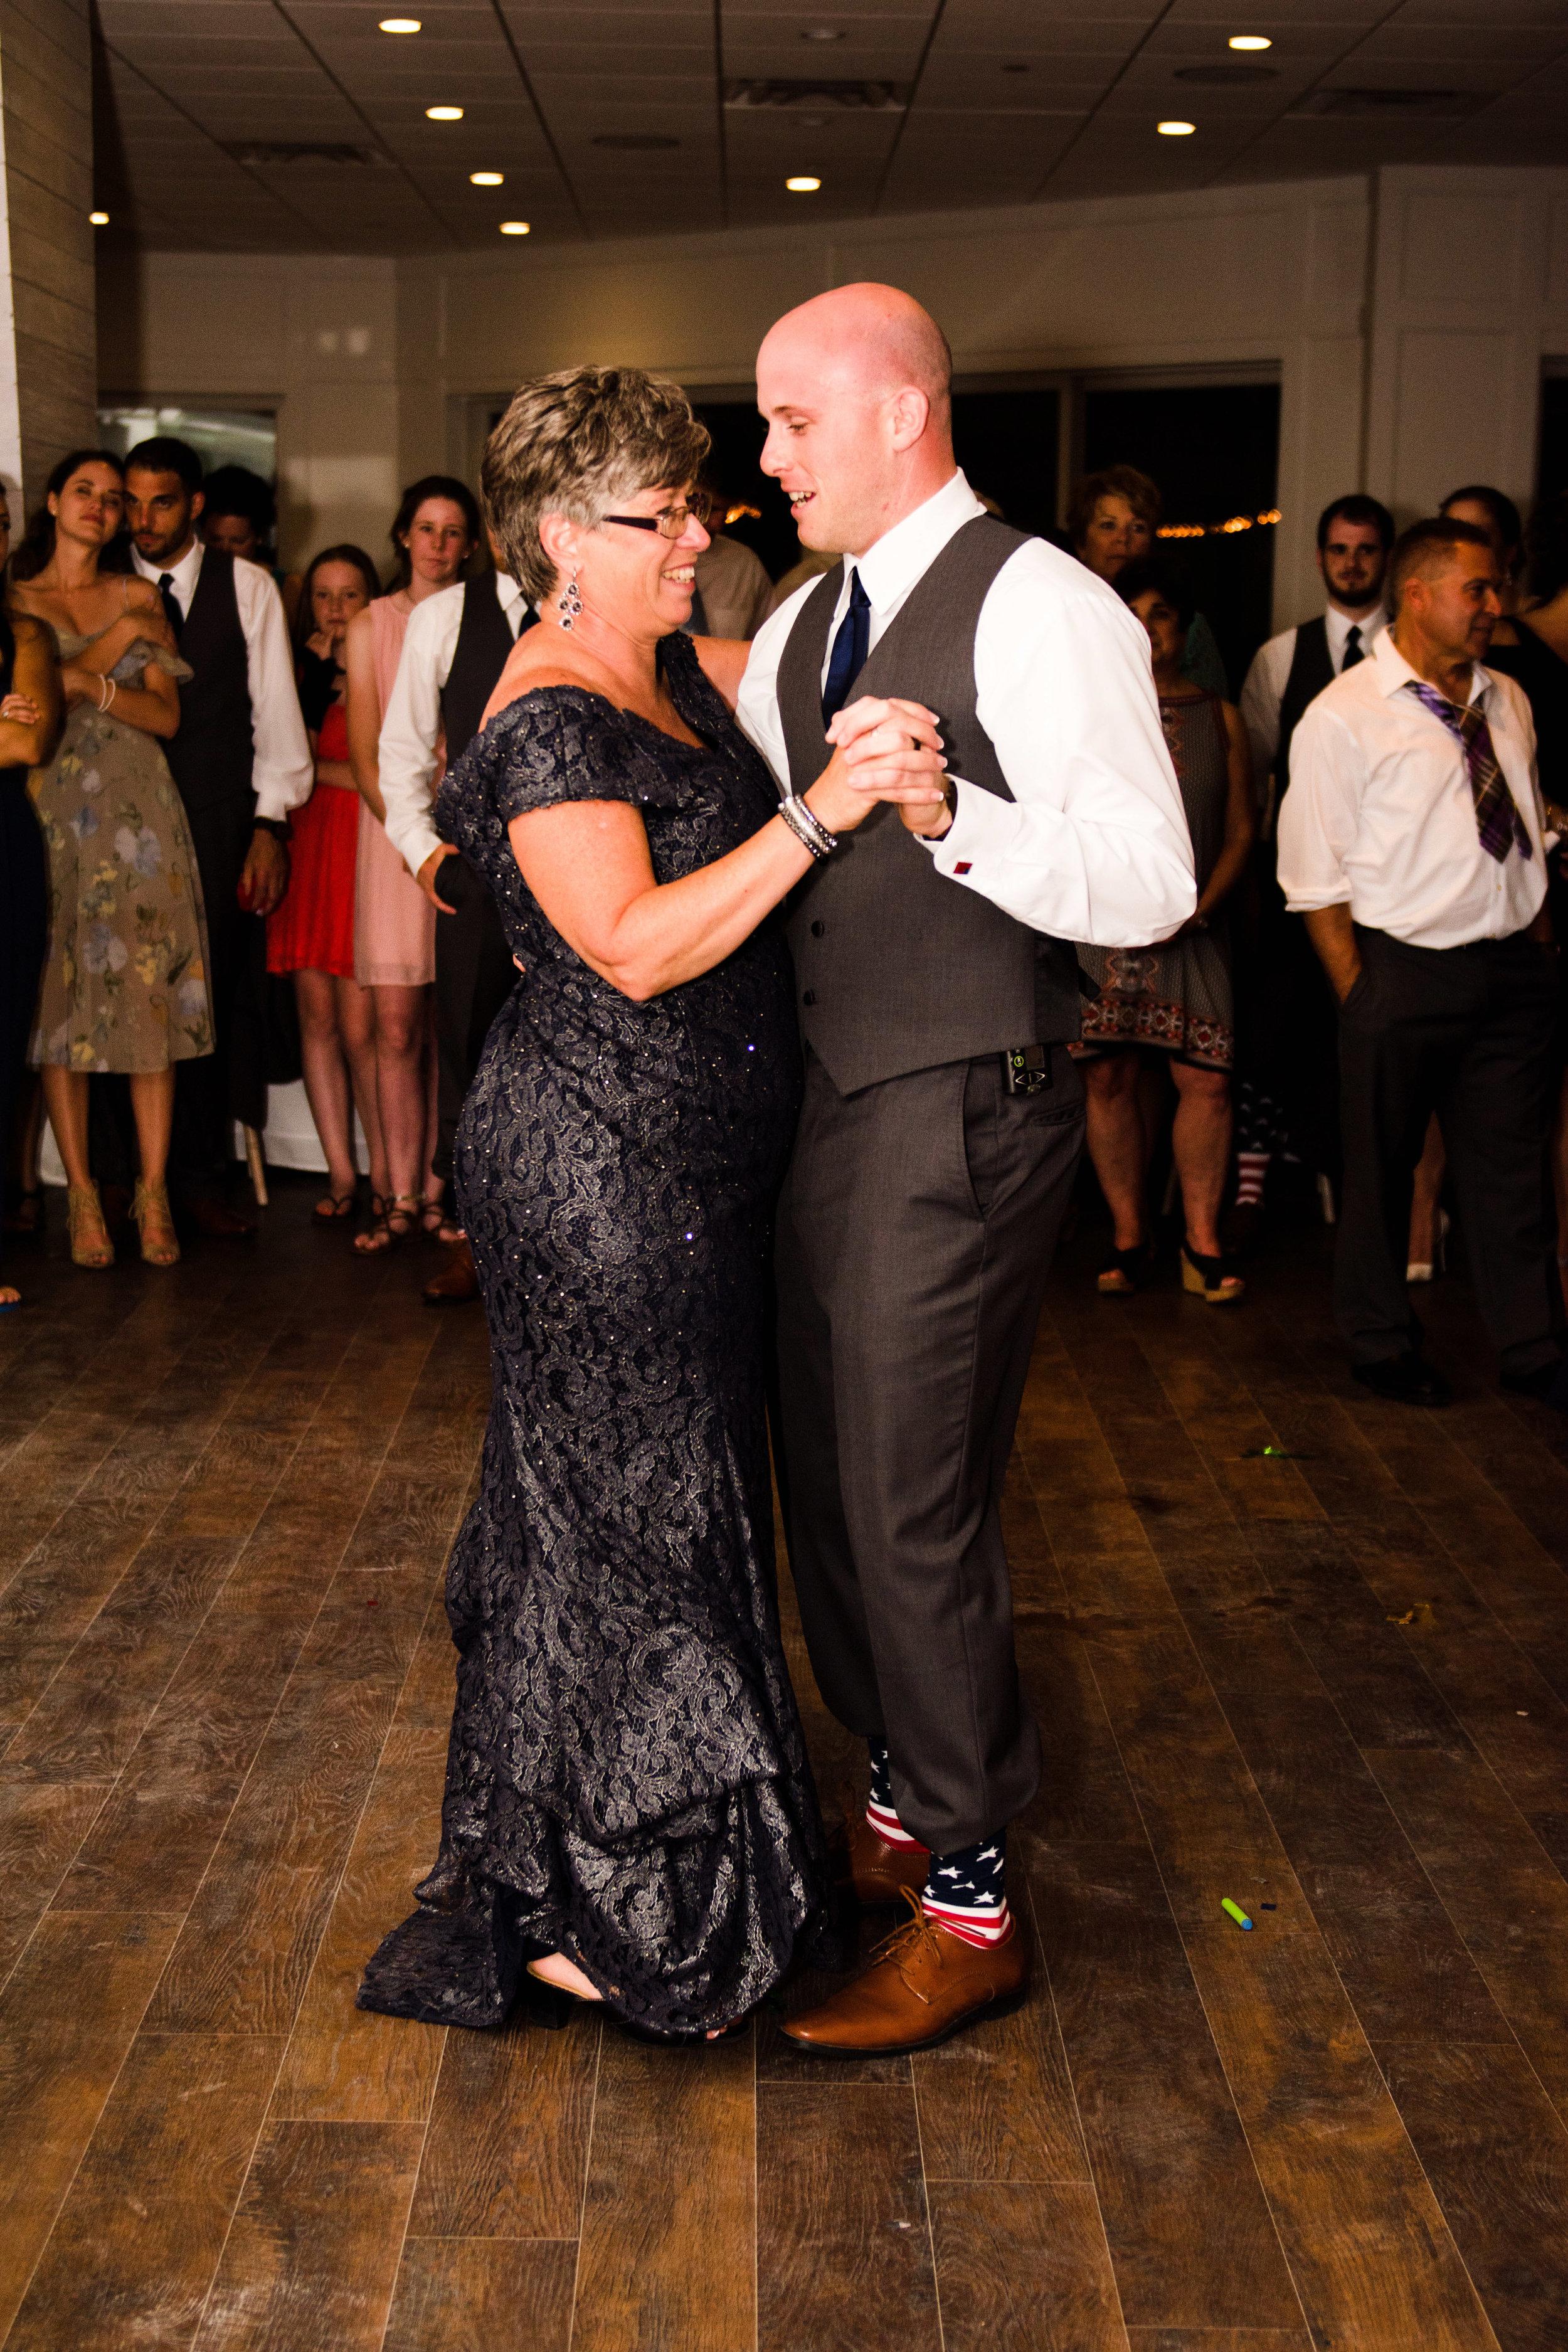 ICONA GOLDEN INN AVALON NJ WEDDING PHOTOGRAPHY  - 089.jpg